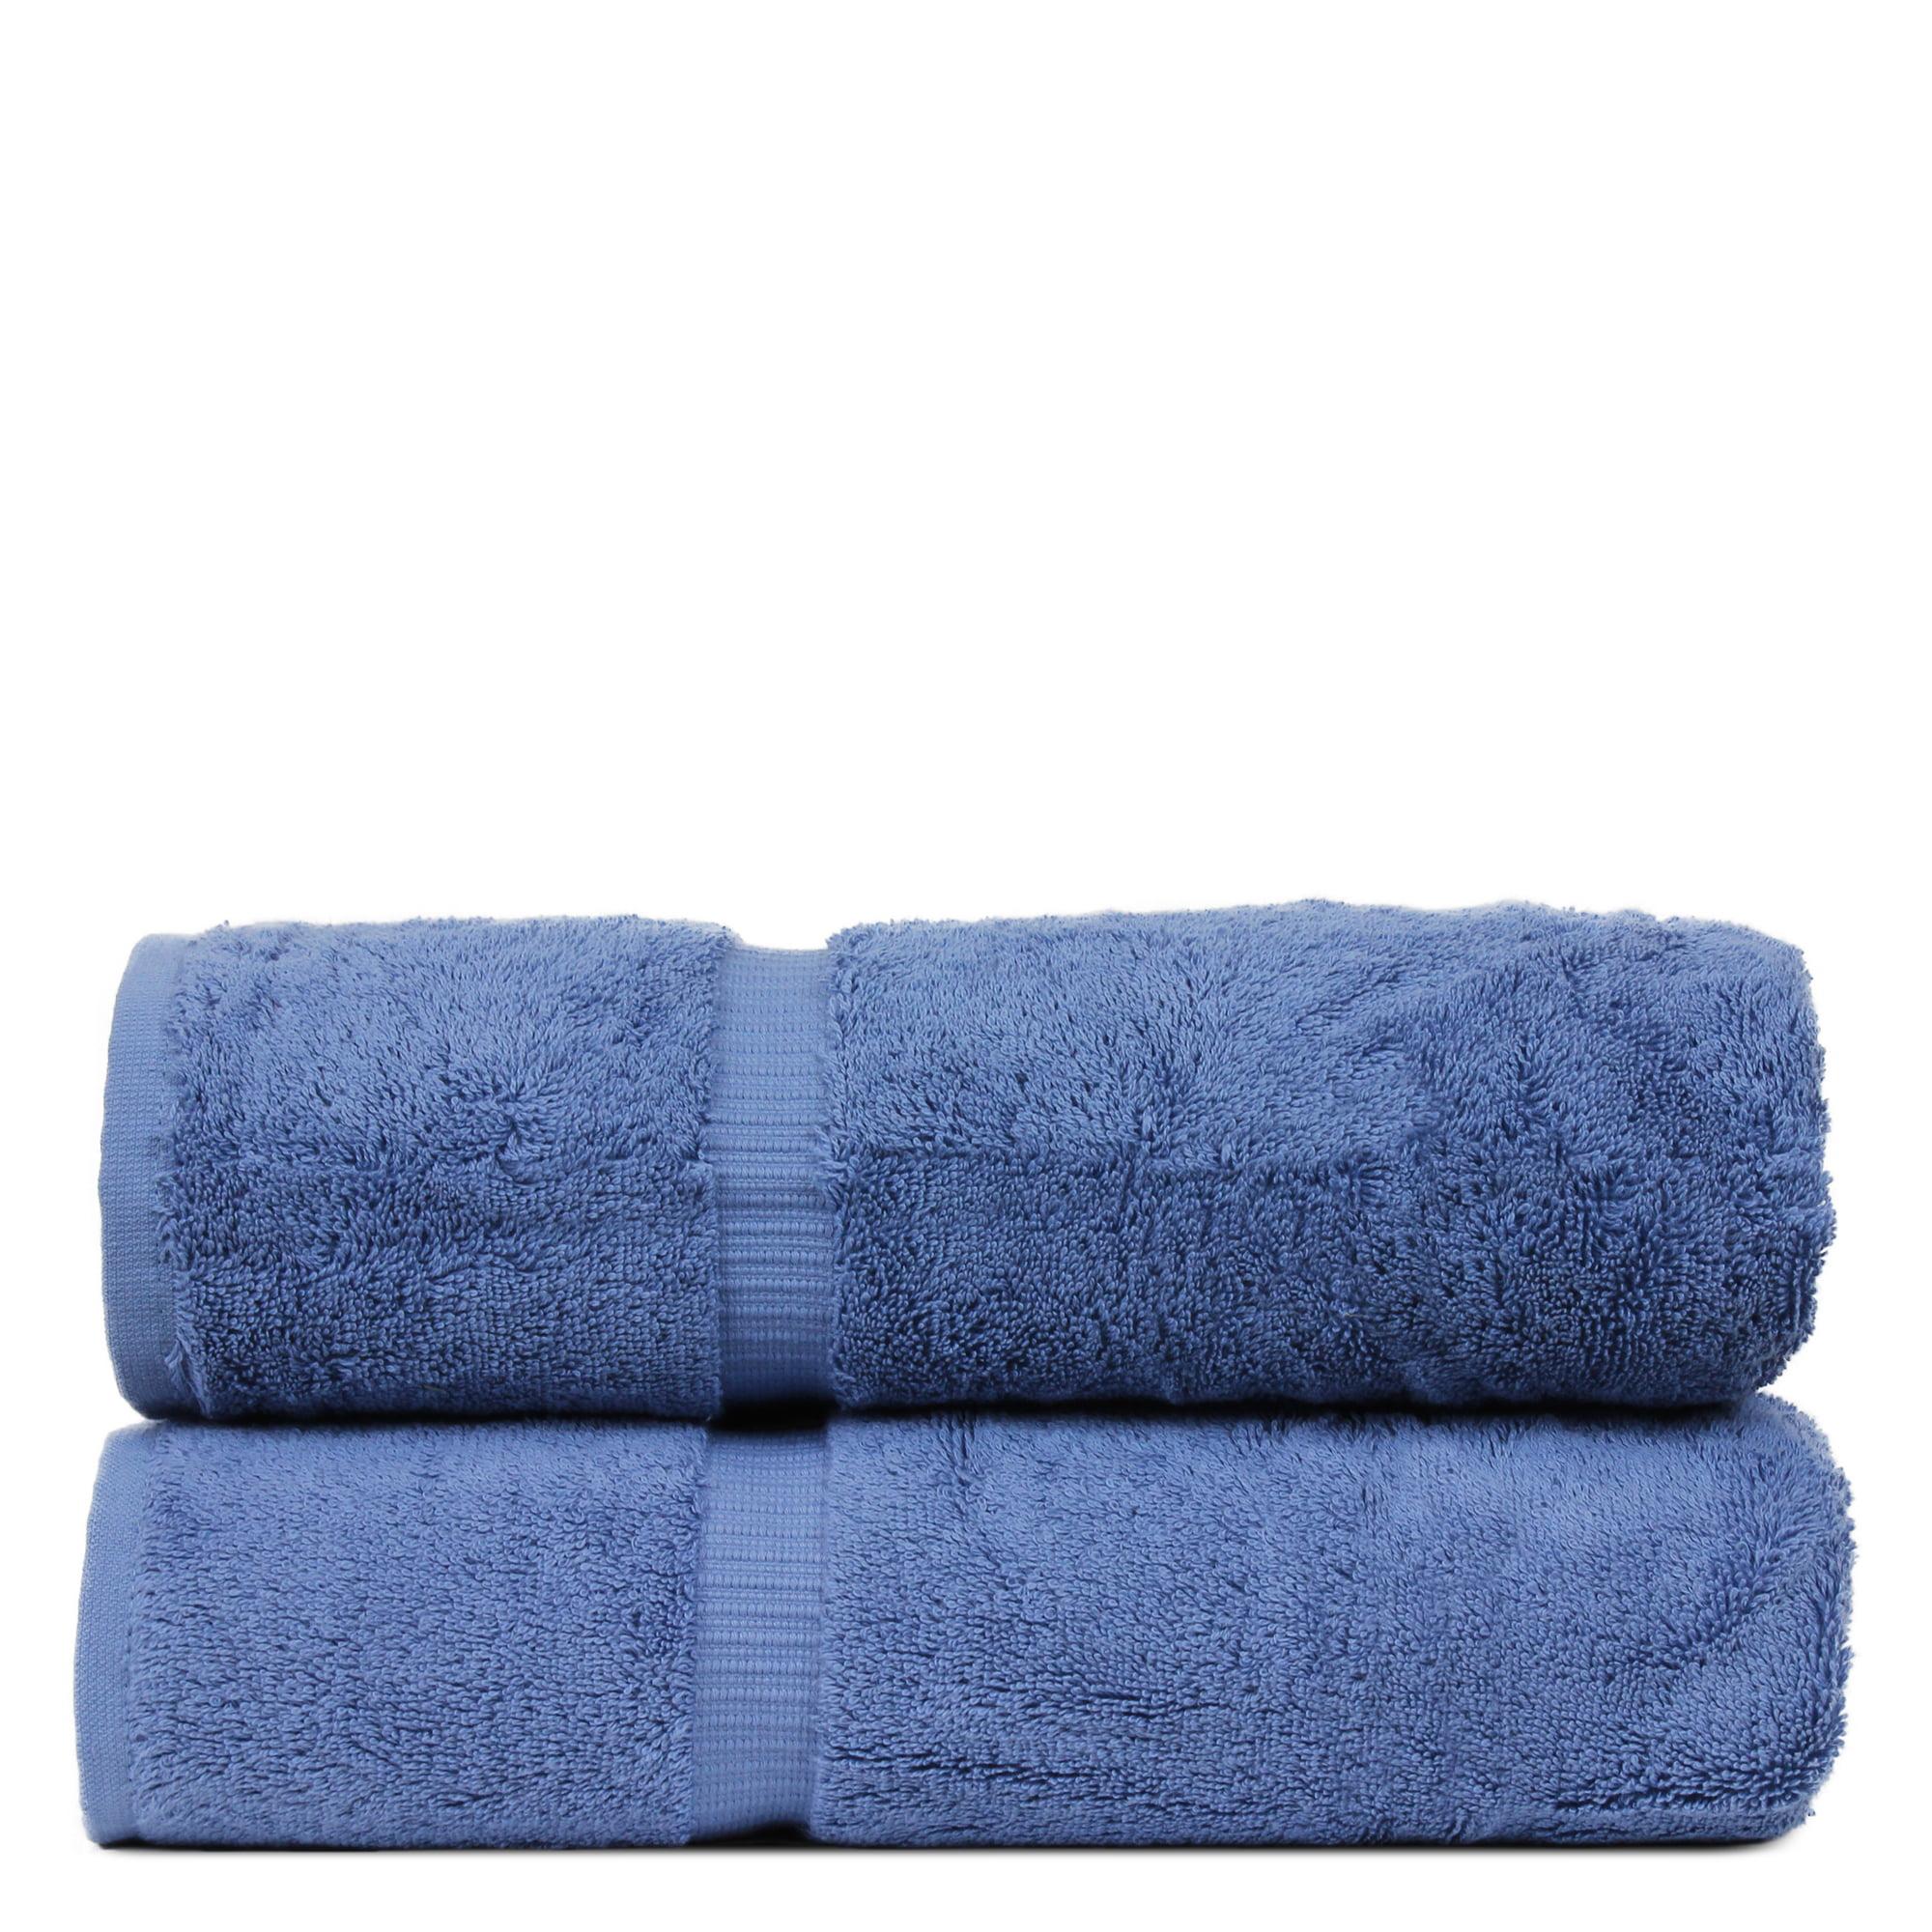 Luxury Hotel & Spa Towel Turkish Cotton Bath Towels - Wedgewood - Dobby Border - Set of 2